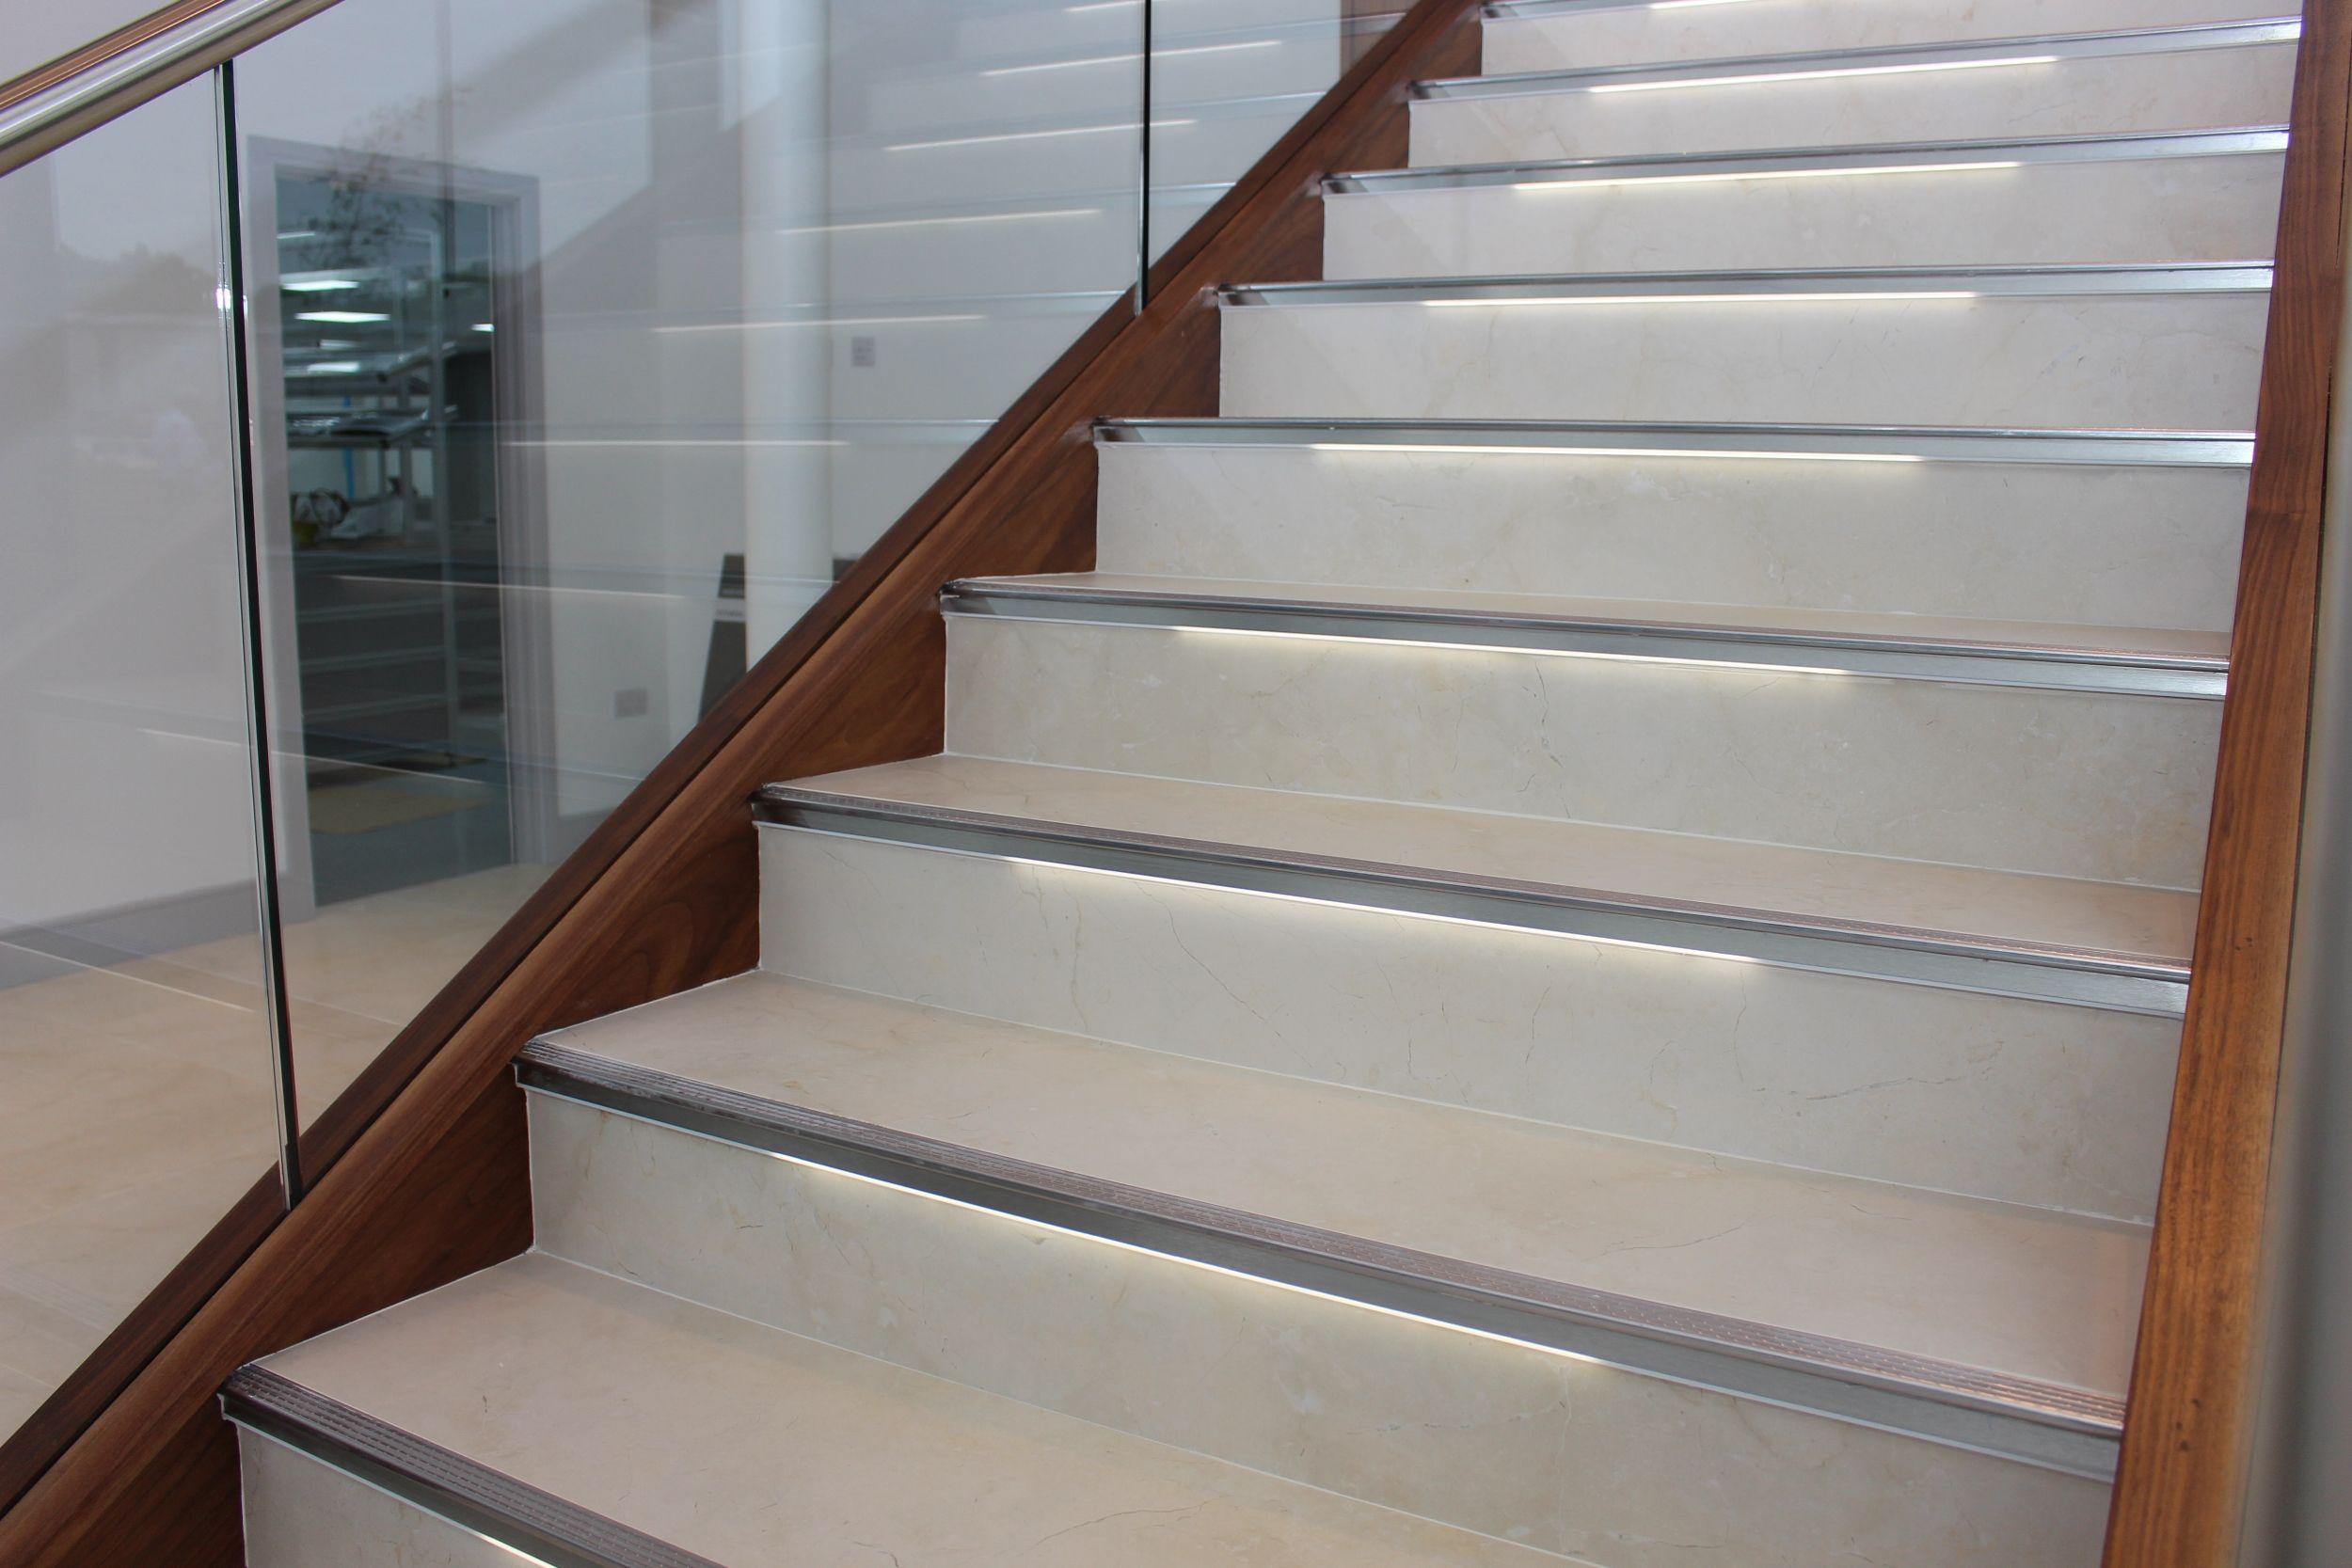 Die Treppe Als Blickfang Eleganz Und Sicherheit Dank Beleuchteter Profile In 2020 Treppe Beleuchten Blickfang